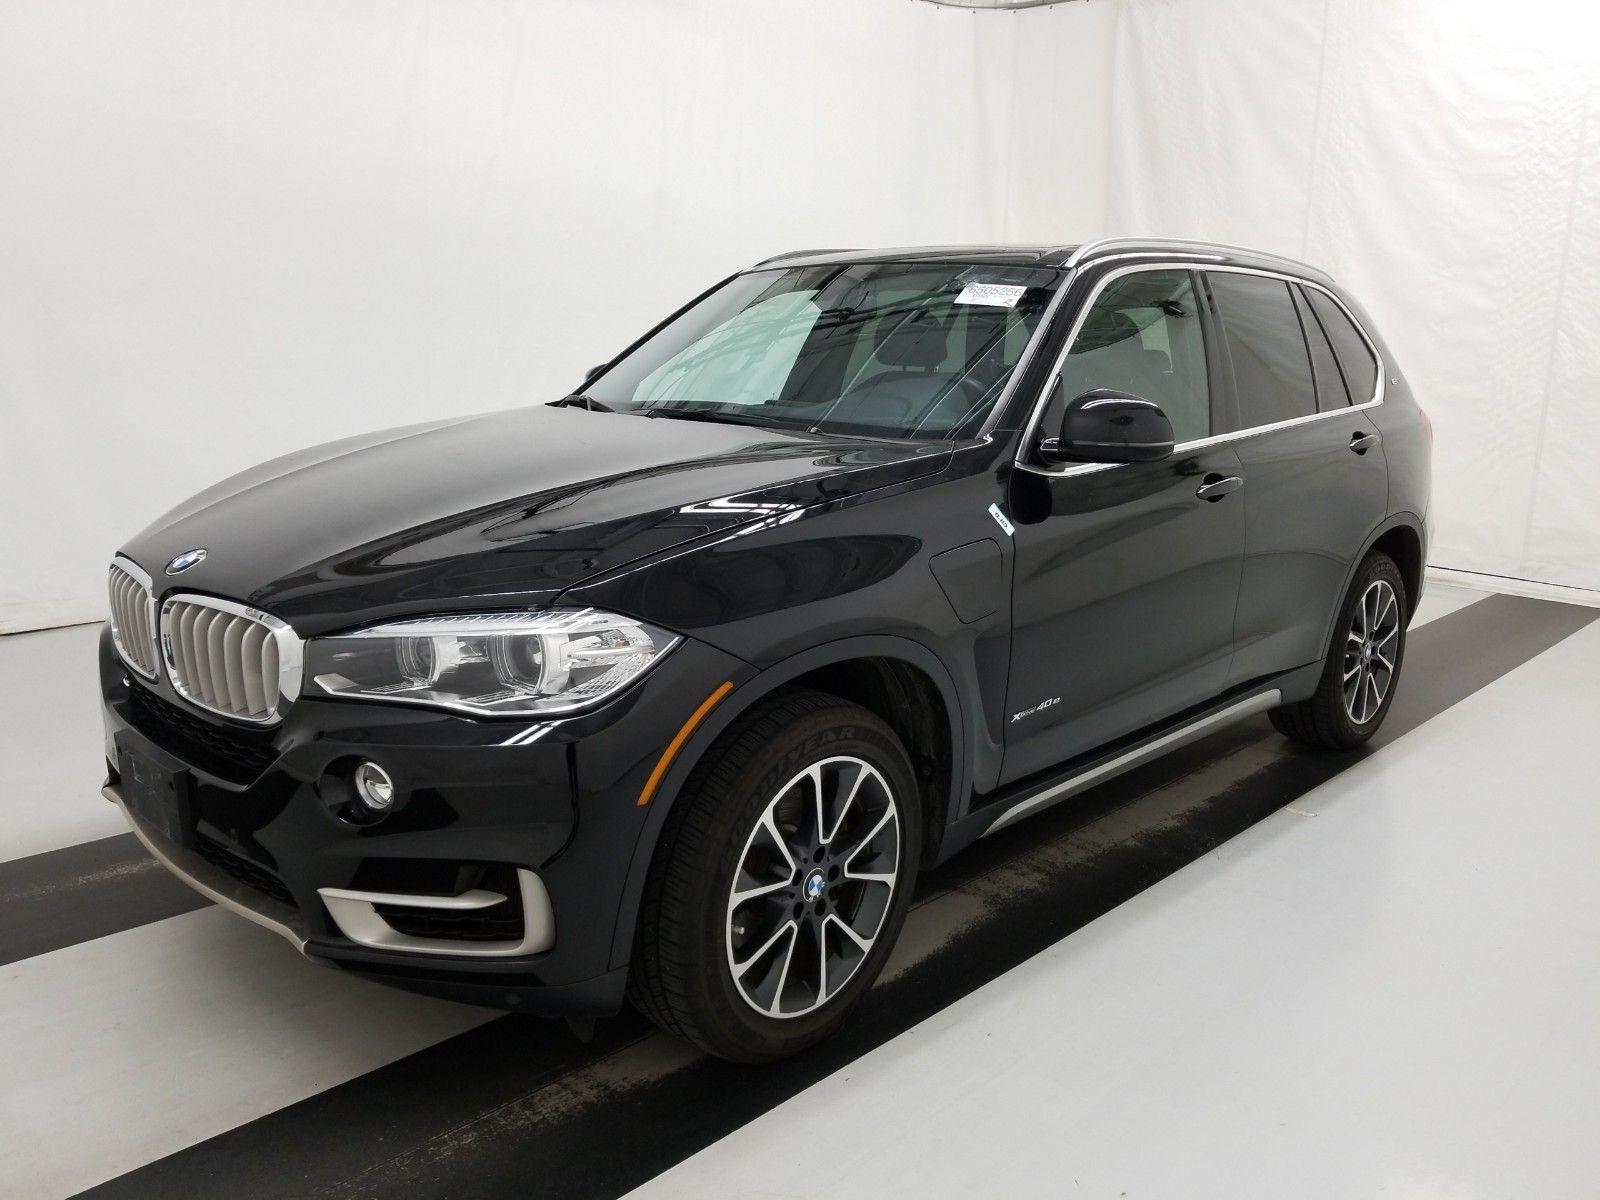 2017 BMW X5 40E XDRIVE 40EX XLINE